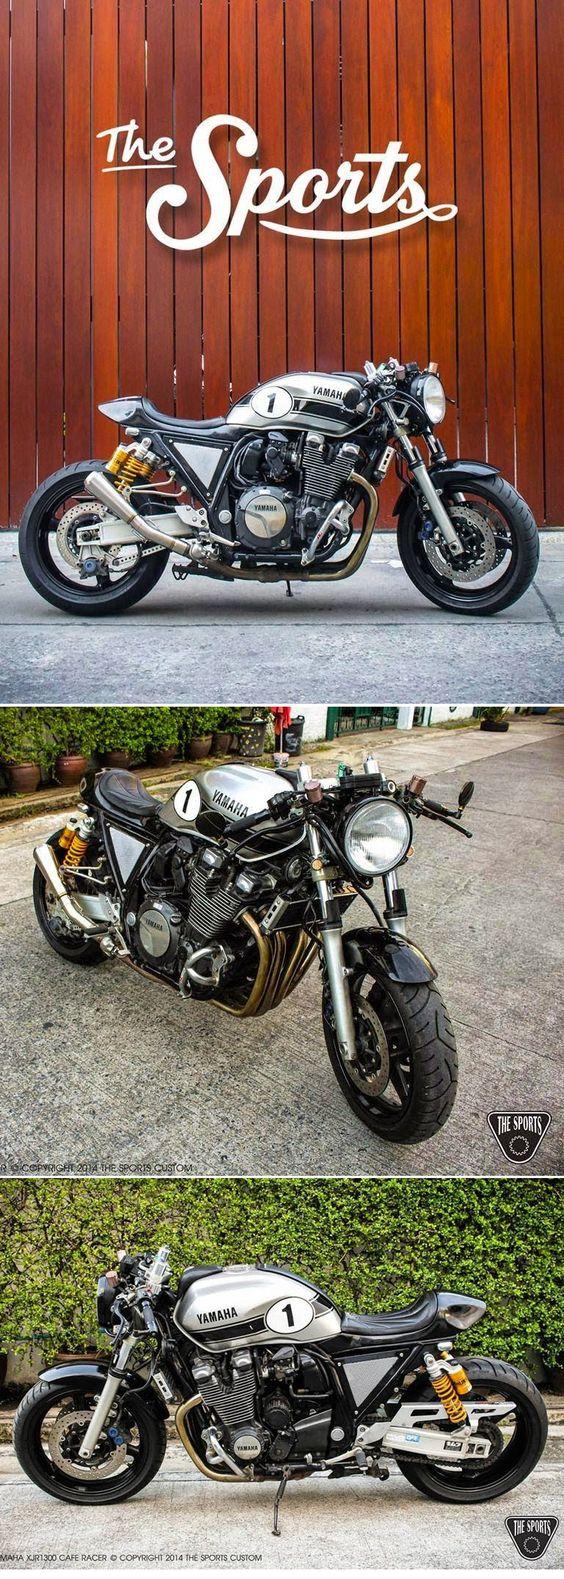 Yamaha Cafe Racer by The Sports Custom based on a Yamaha XJR1300